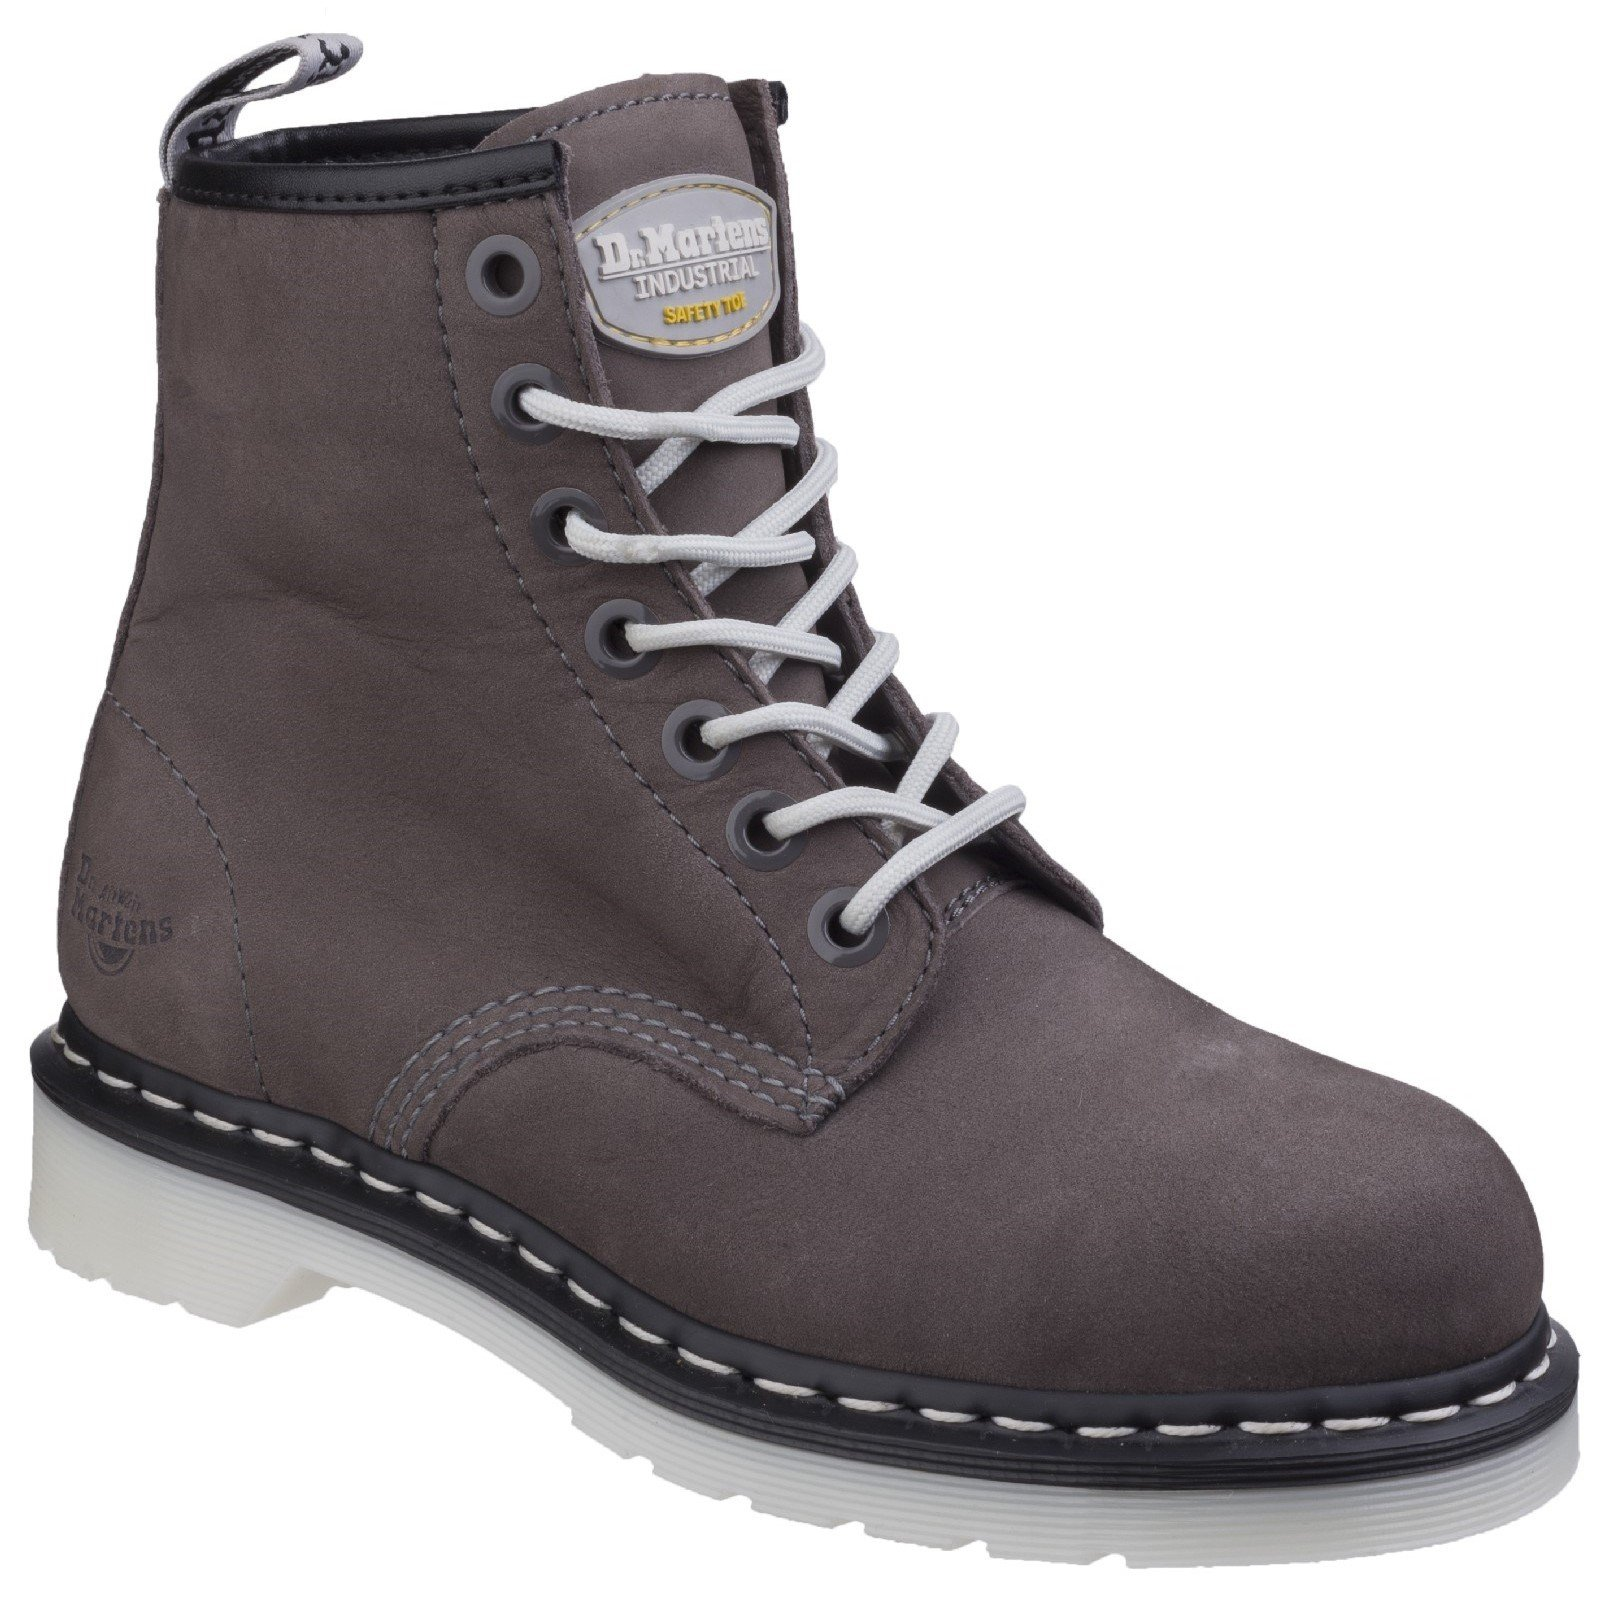 Dr Martens Women's Maple Classic Steel-Toe Work Boot Grey 26783 - Grey Wind River 6